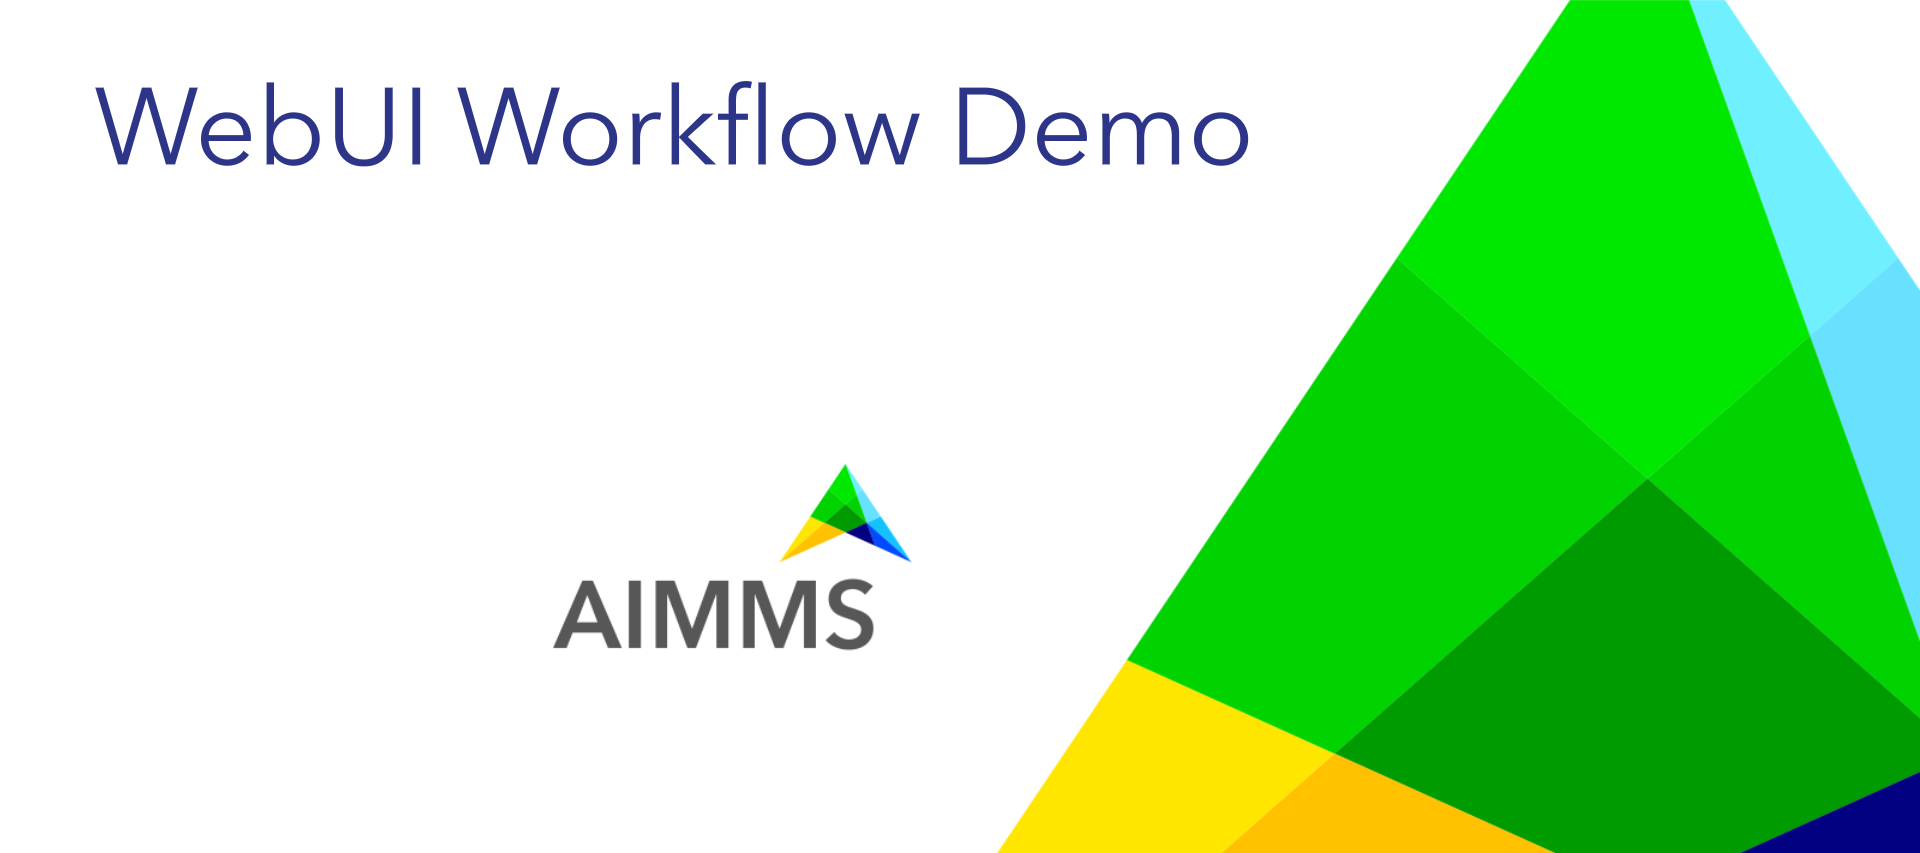 WebUI Workflow Demo